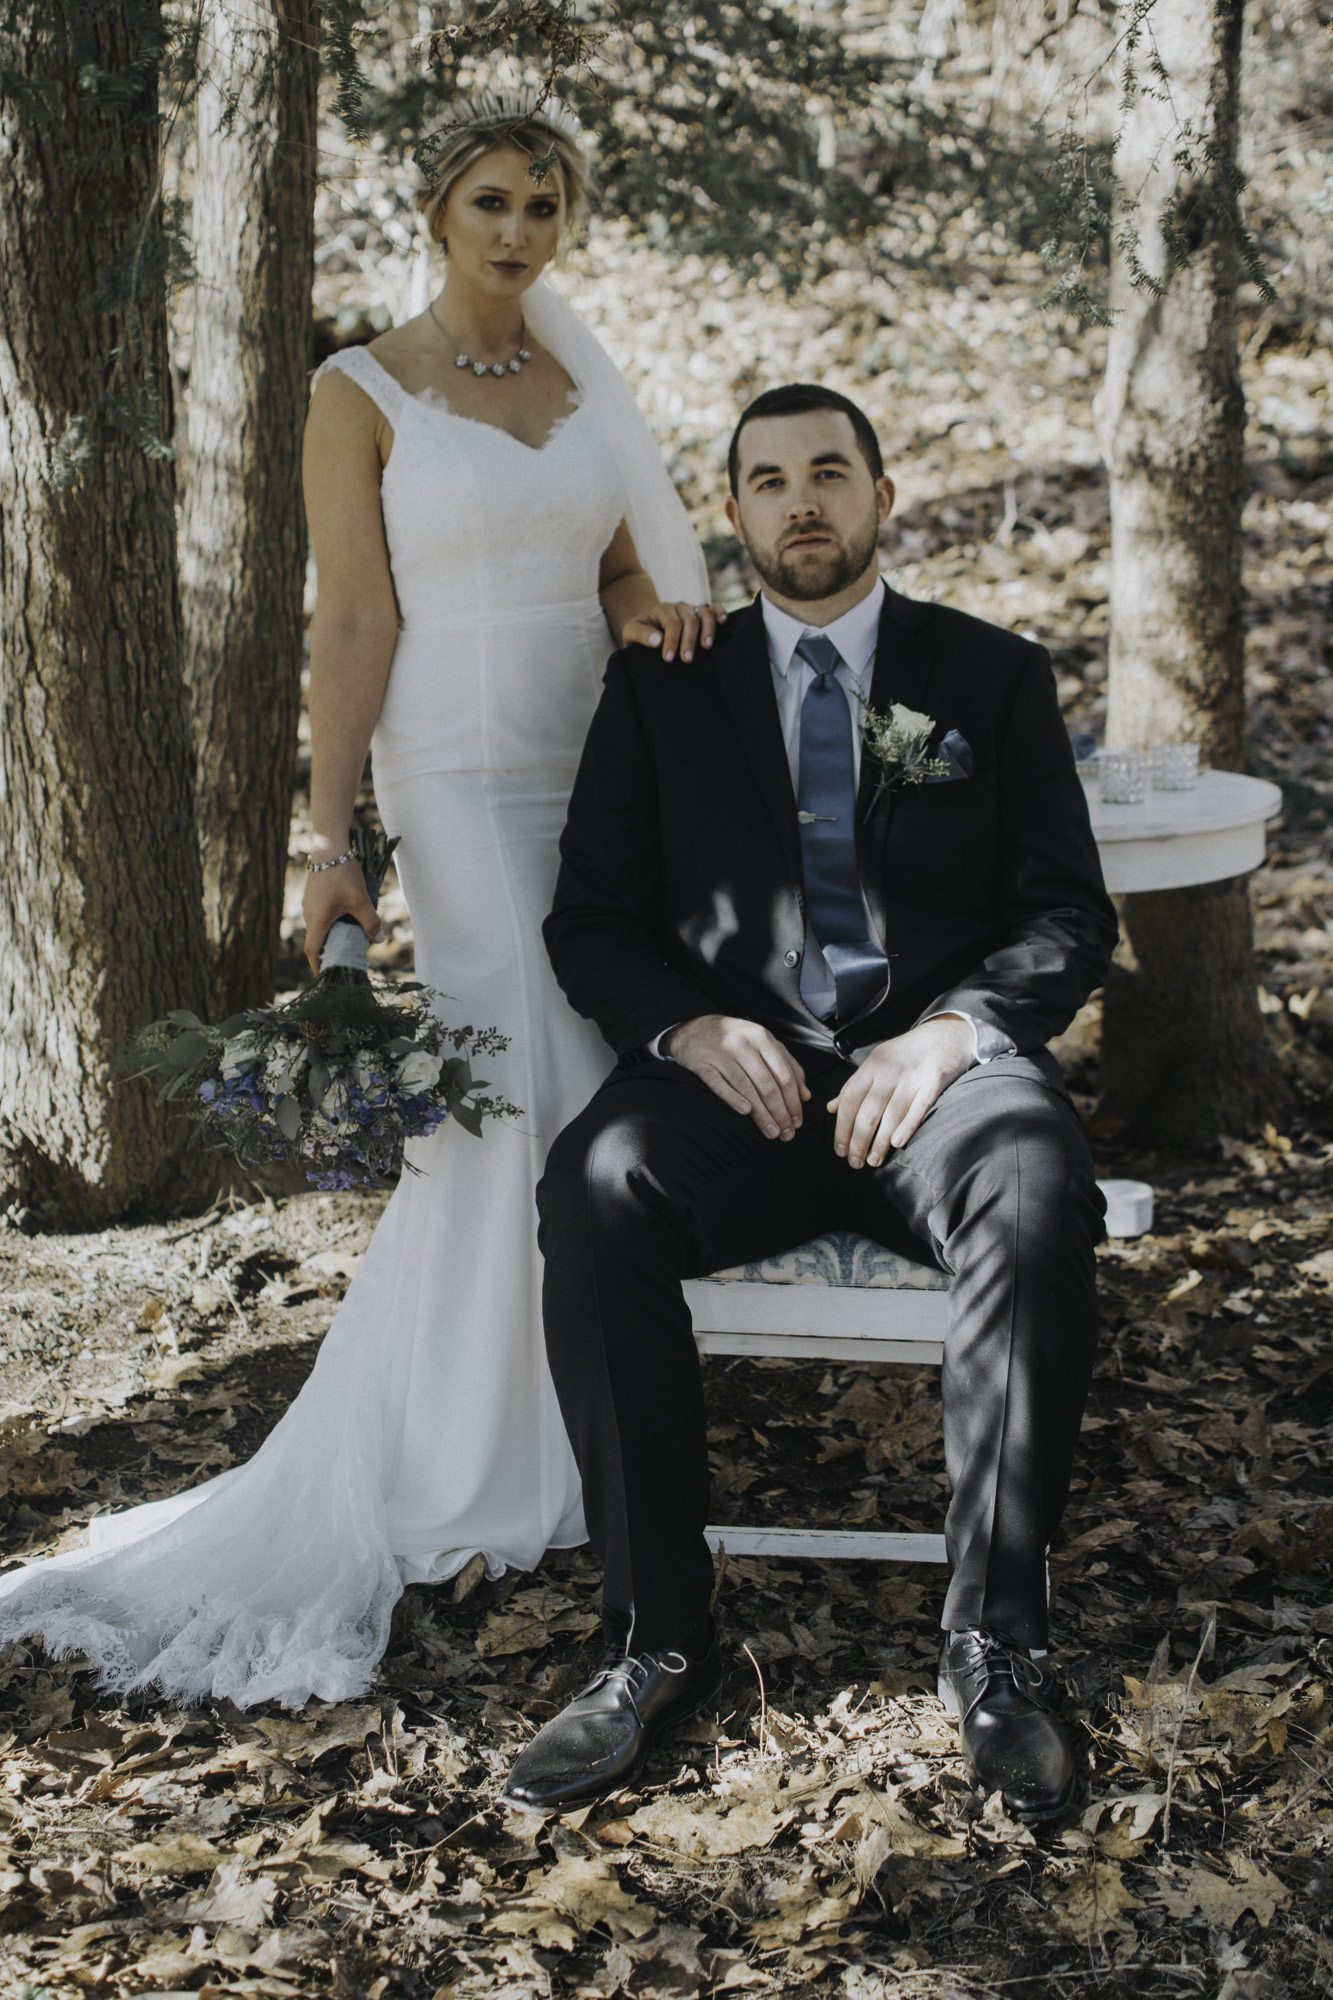 Cate_Ann_Photography_Dayton_Ohio_Wedding_Elopement_And_Engagement_PhotographerDSC_5830.jpg